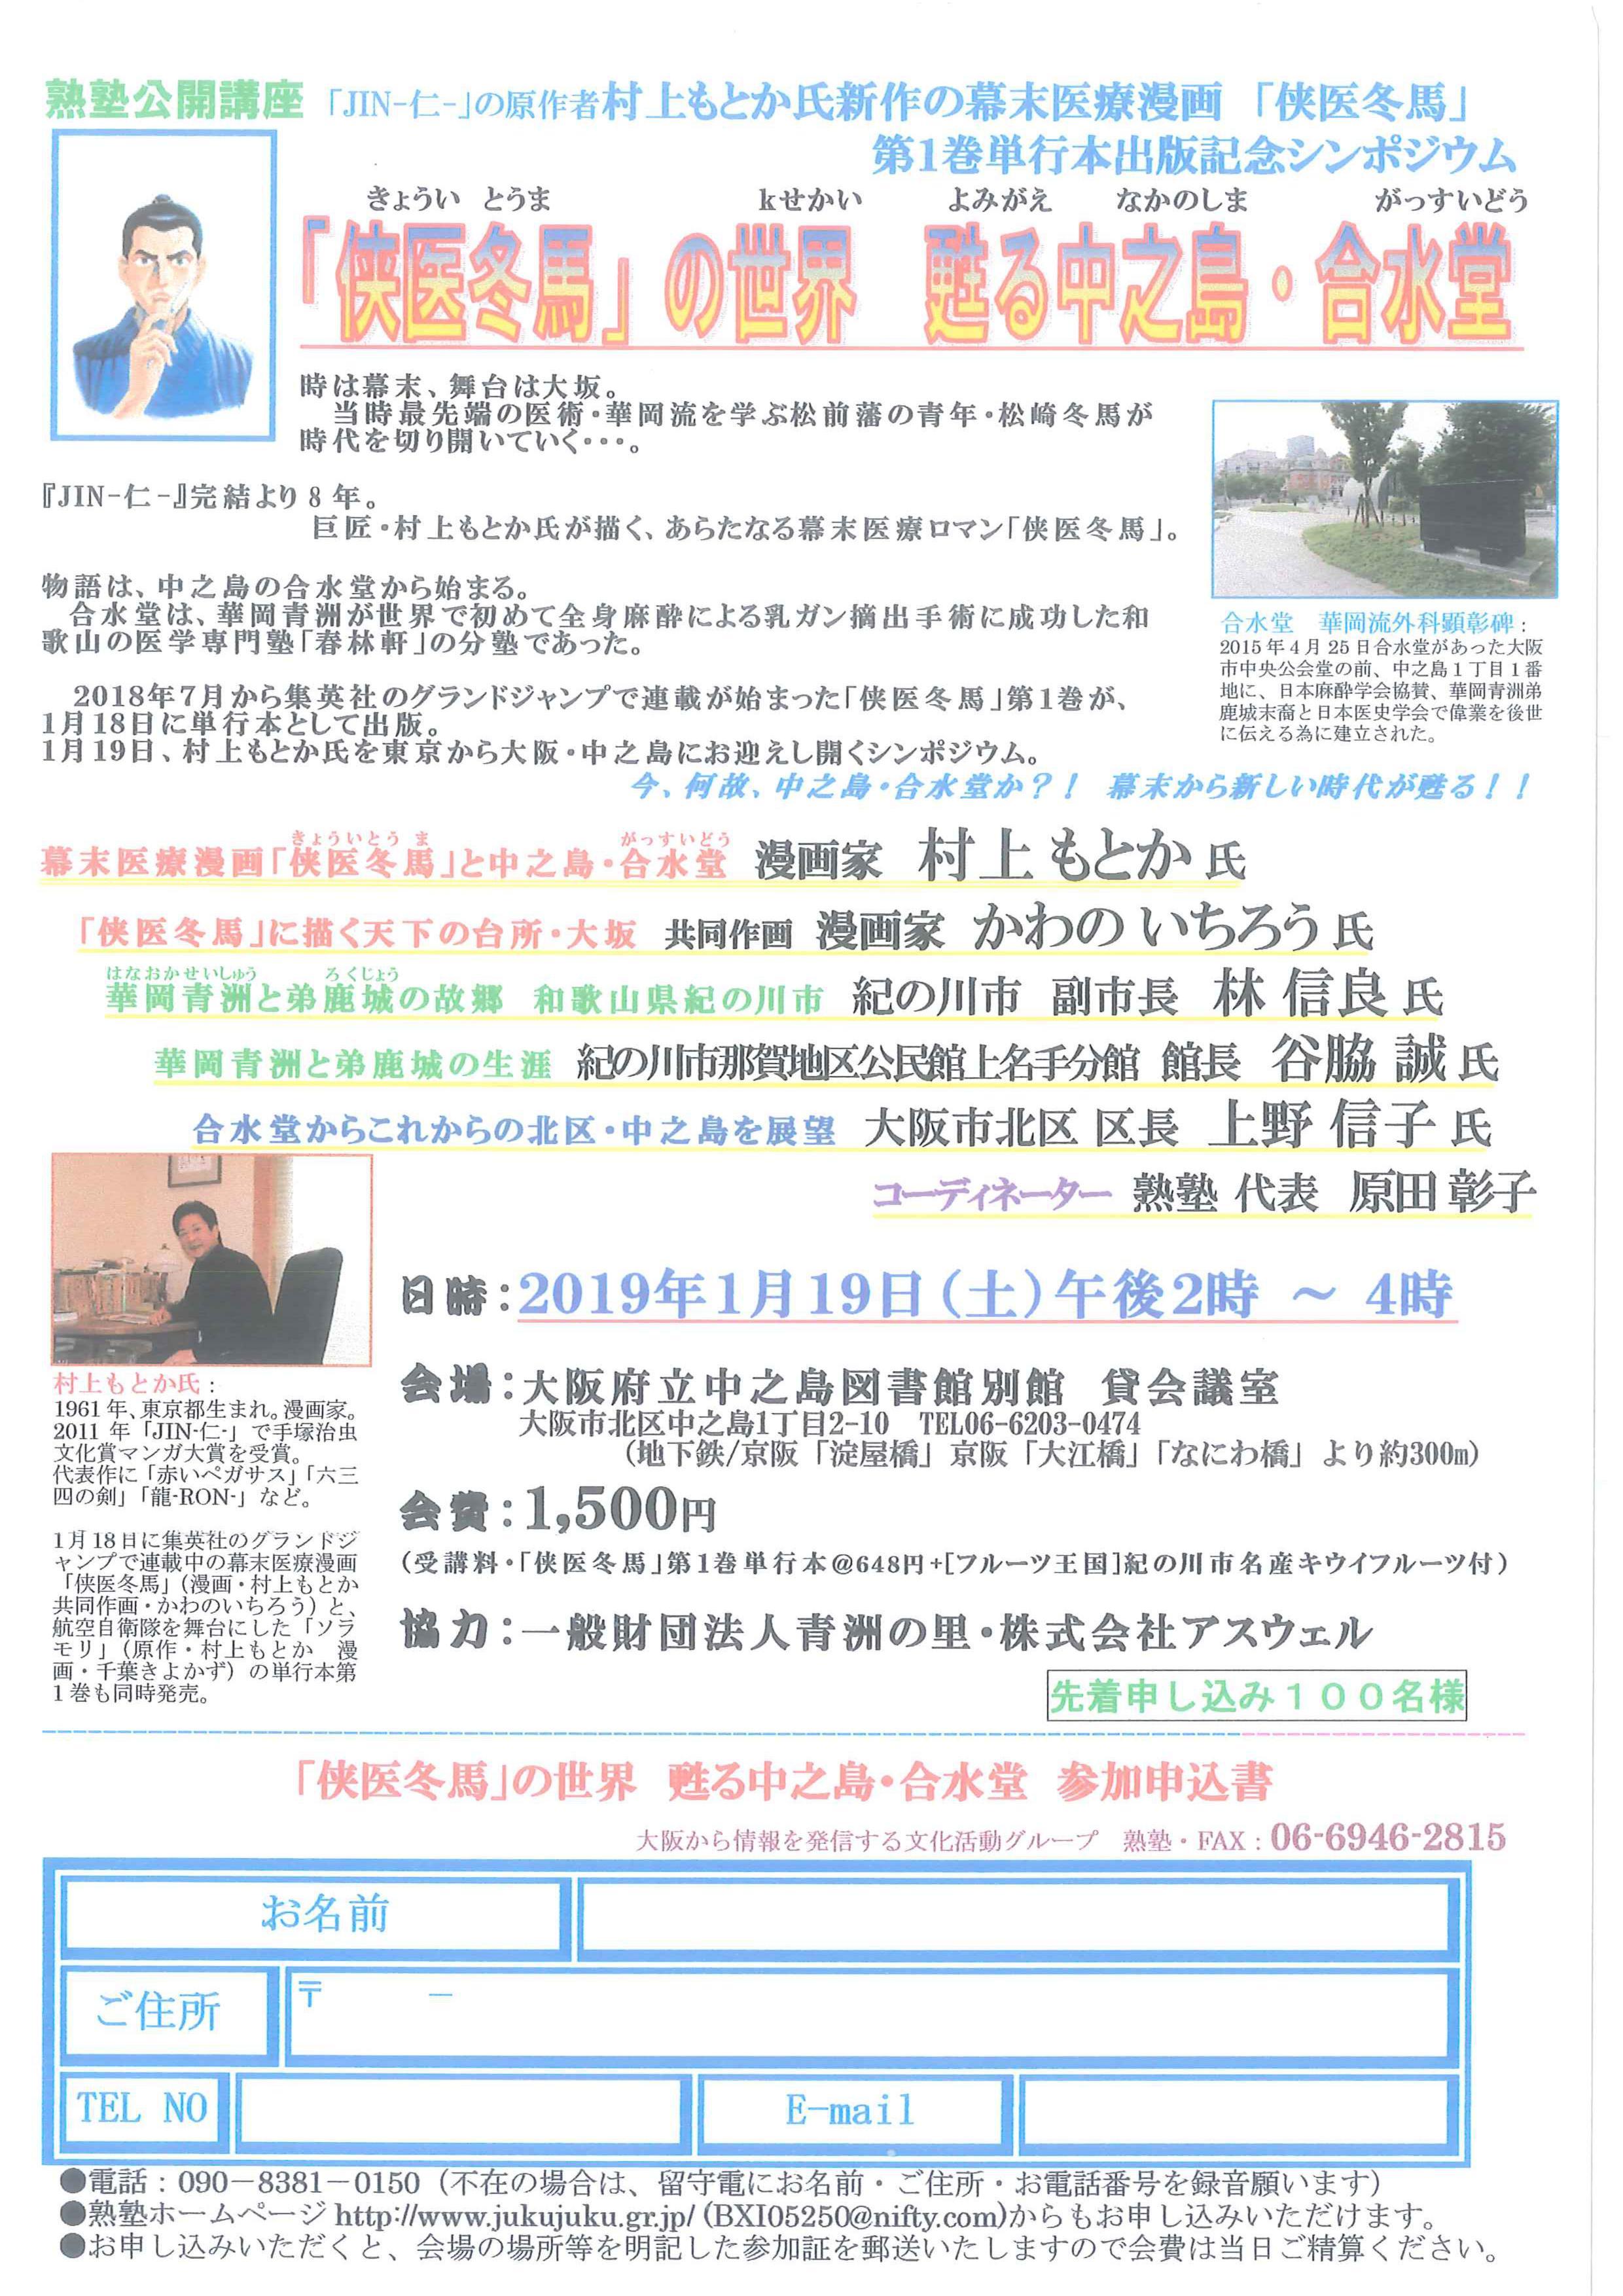 「侠医冬馬」の世界 甦る中之島・合水堂 1月19日(土)